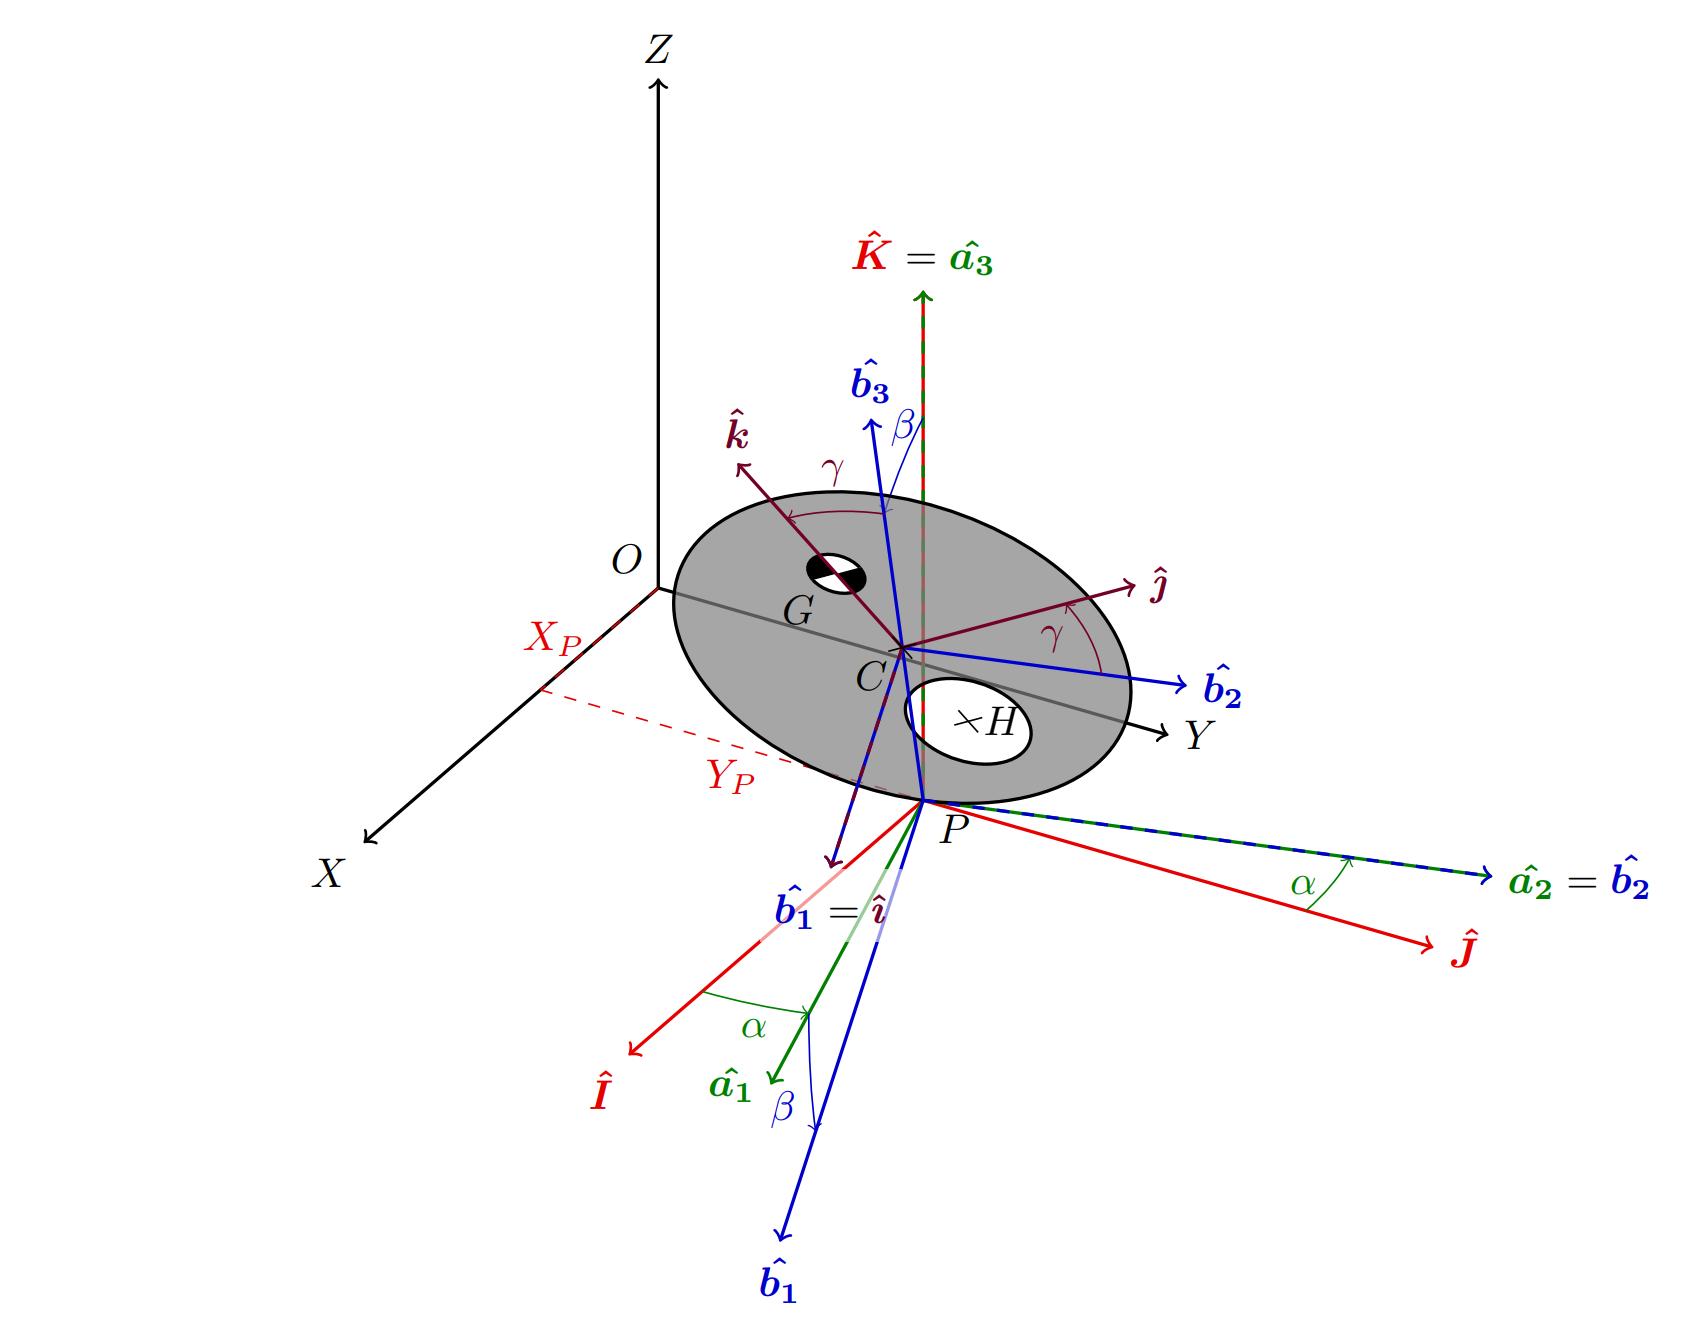 TikZ 绘制三维坐标系的示意图样例